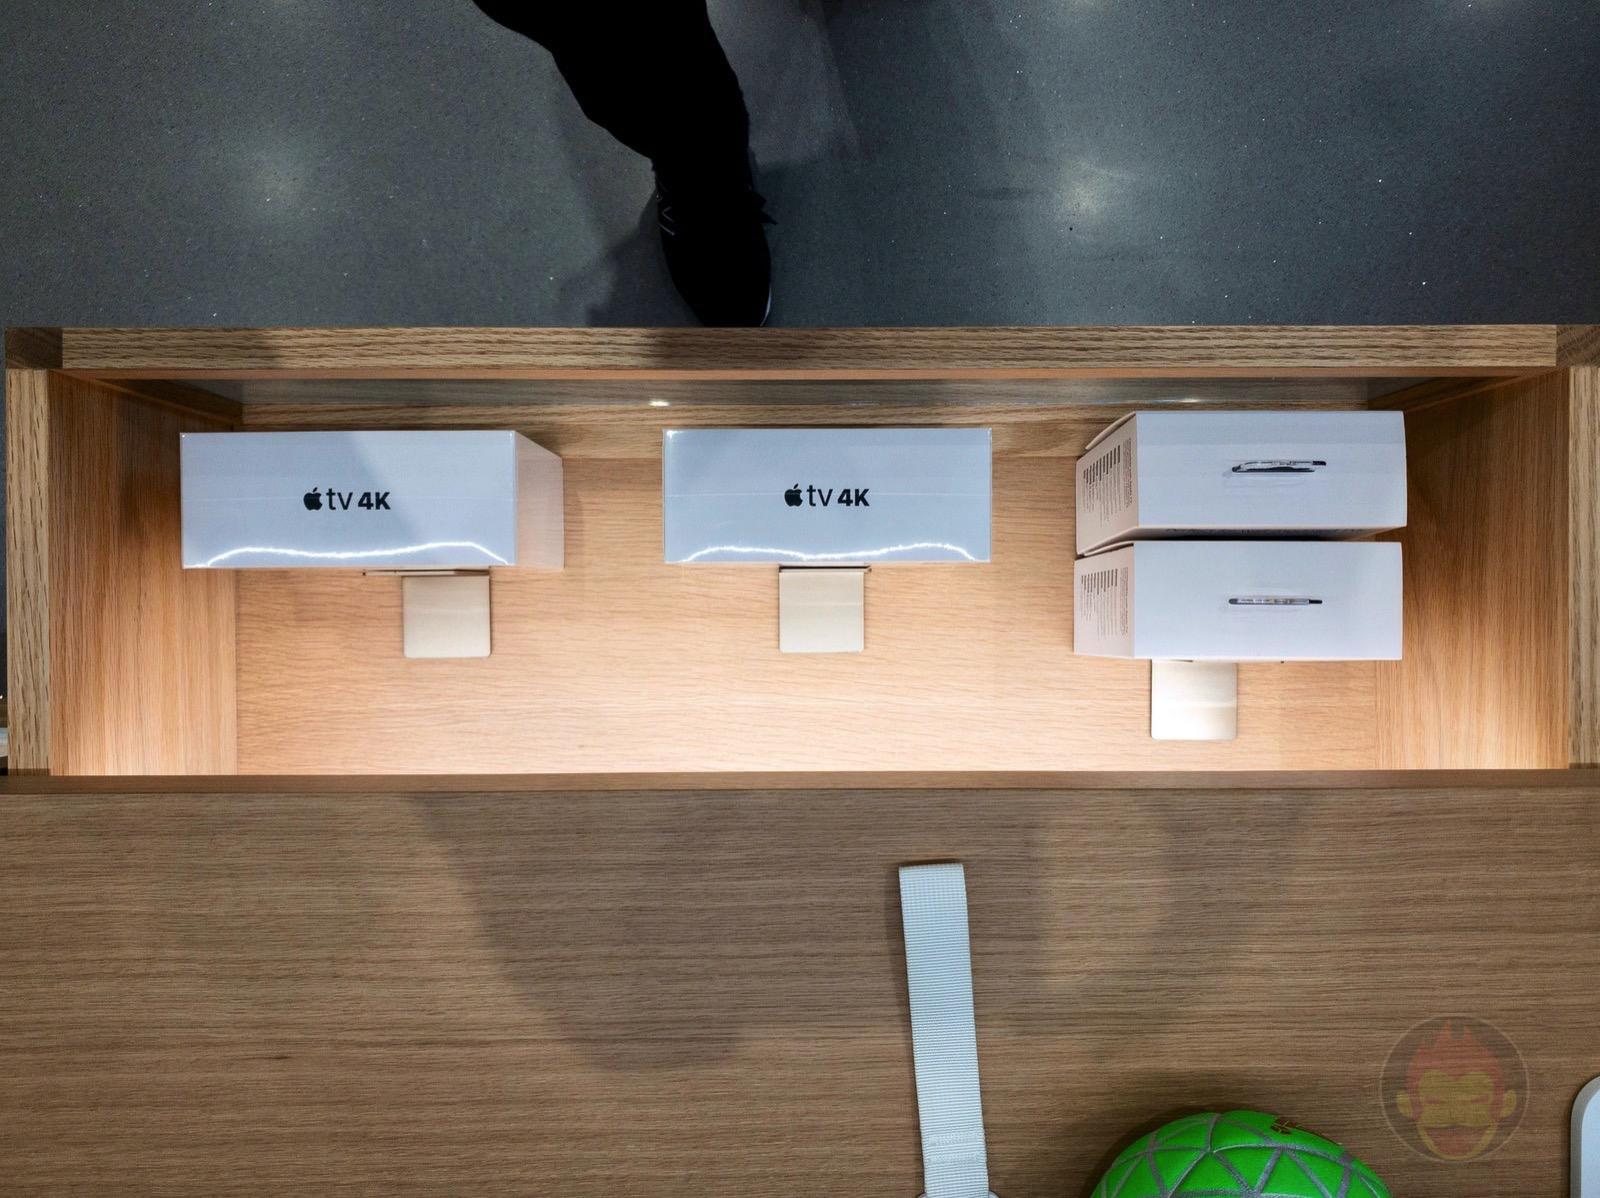 Apple Store Omotesando Basement floor renewal 11